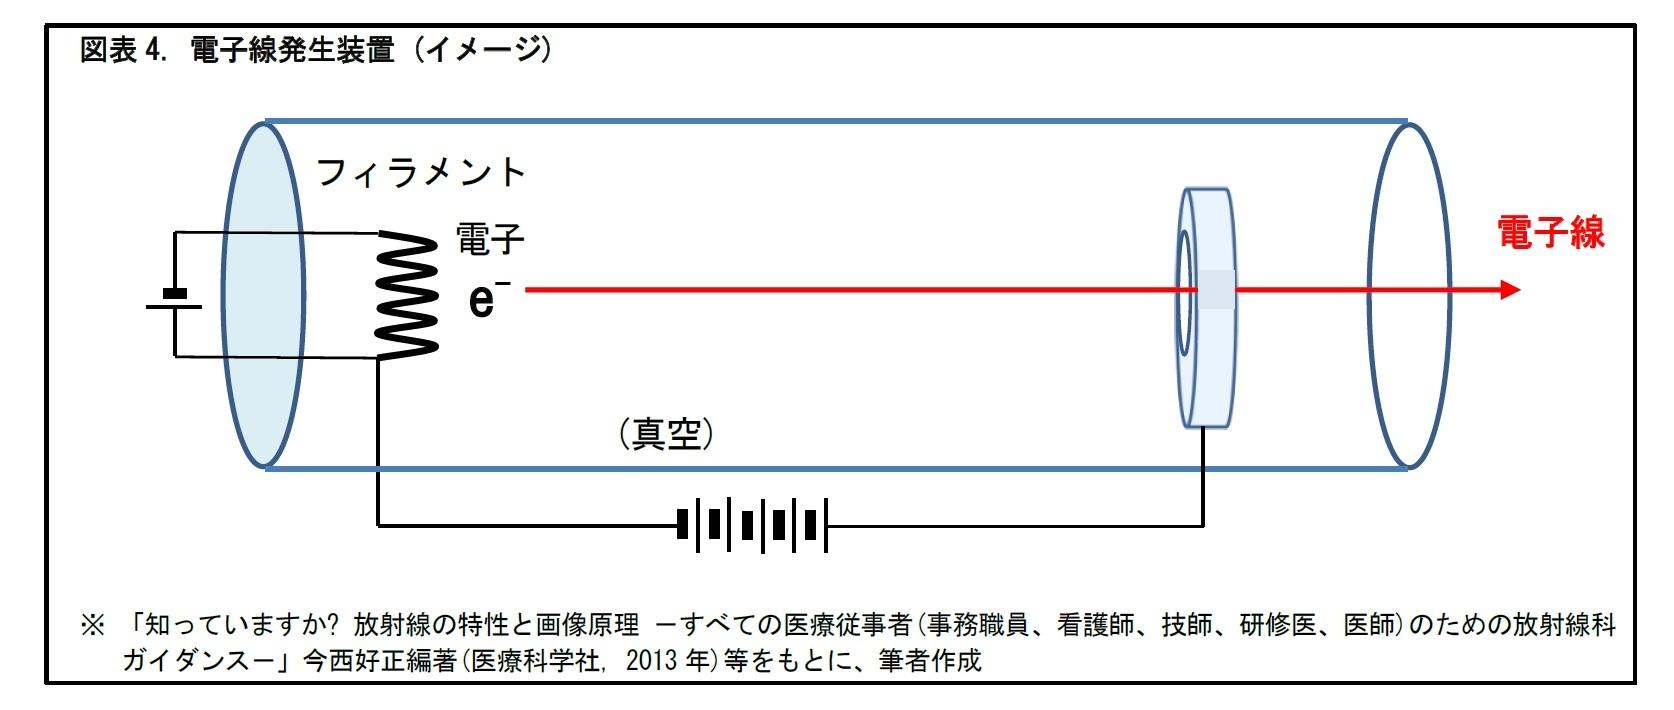 図表4. 電子線発生装置 (イメージ)